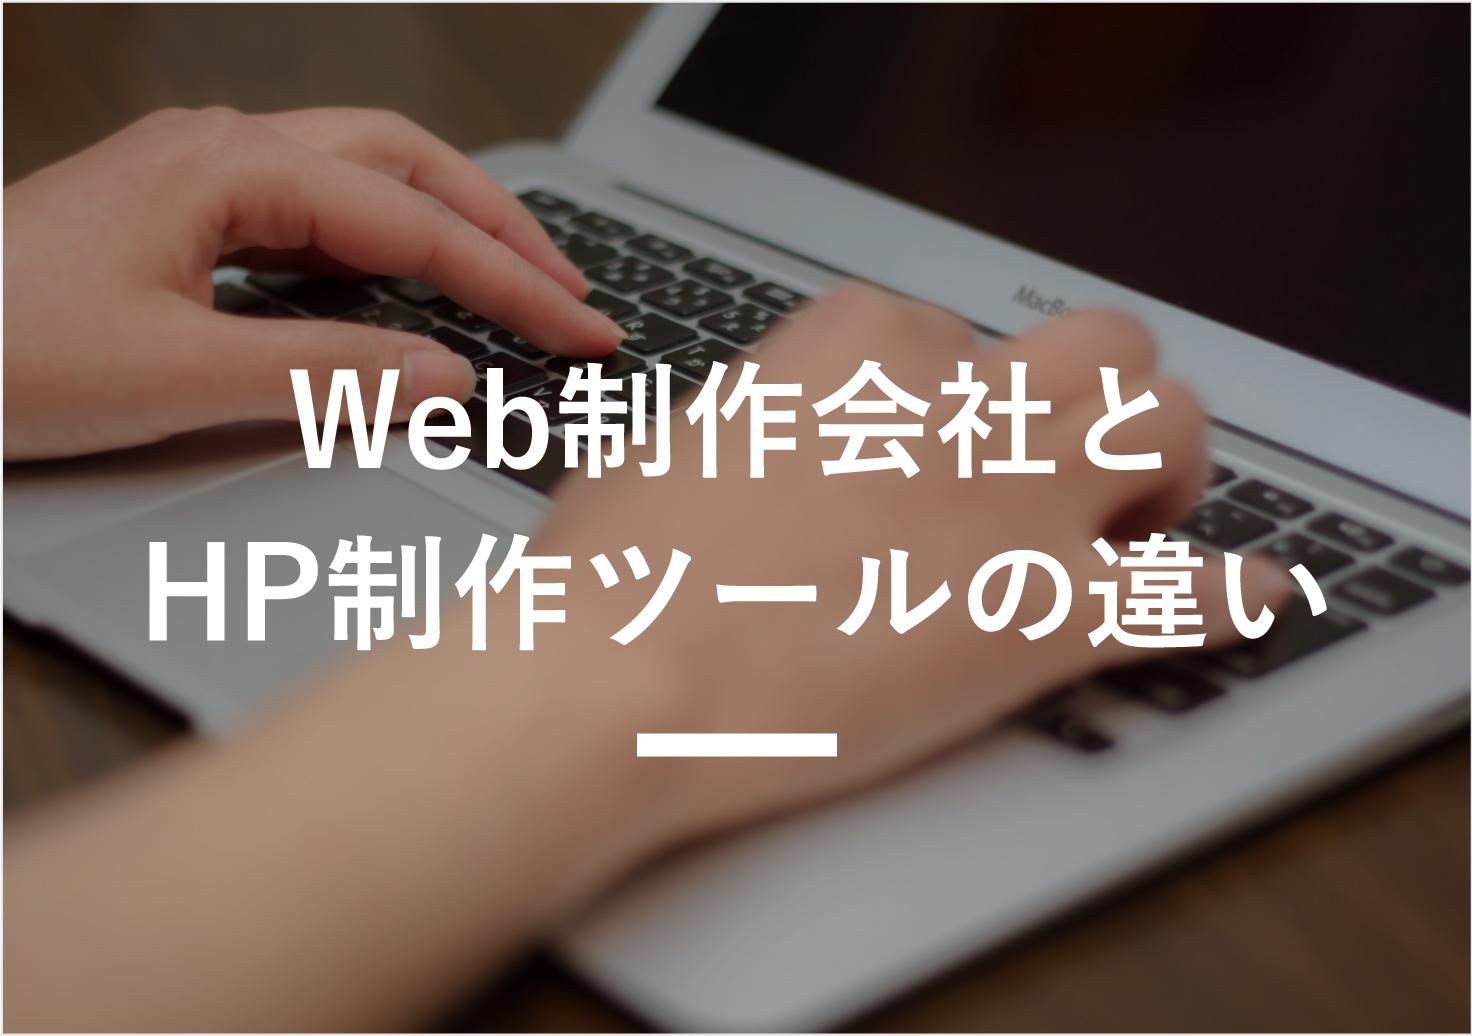 Web制作会社とホームページ制作ツールの違い